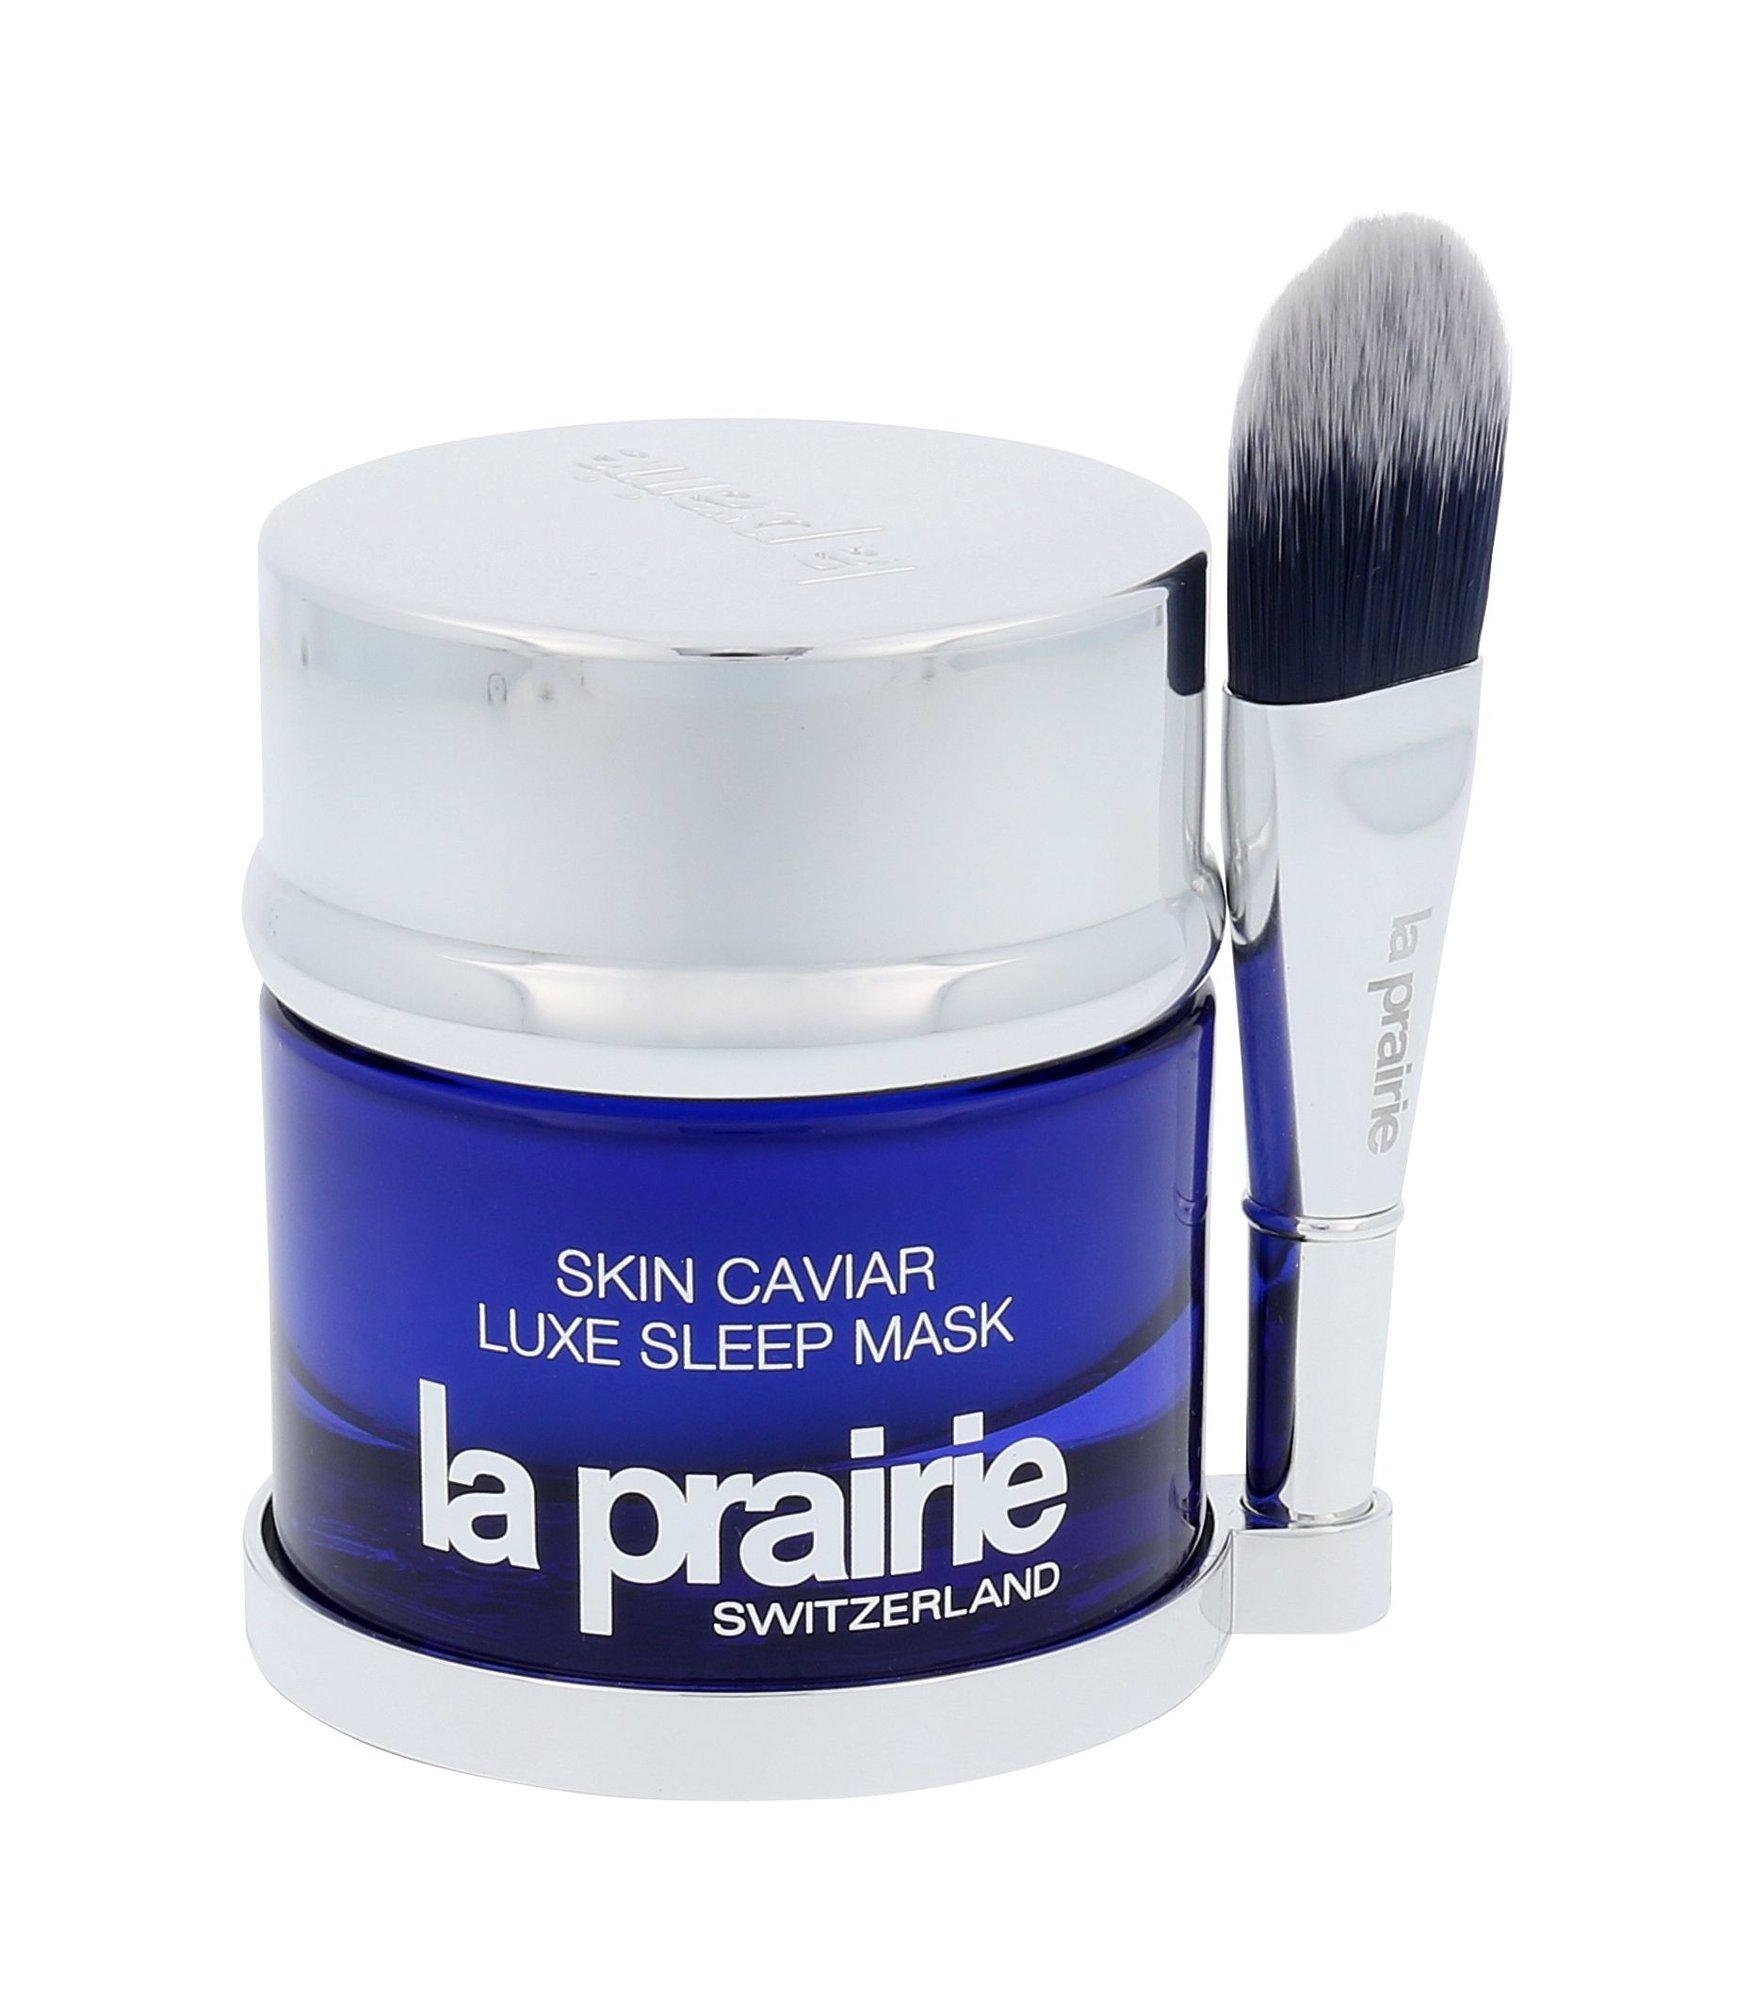 La Prairie Skin Caviar Luxe Sleep Mask Cosmetic 50ml